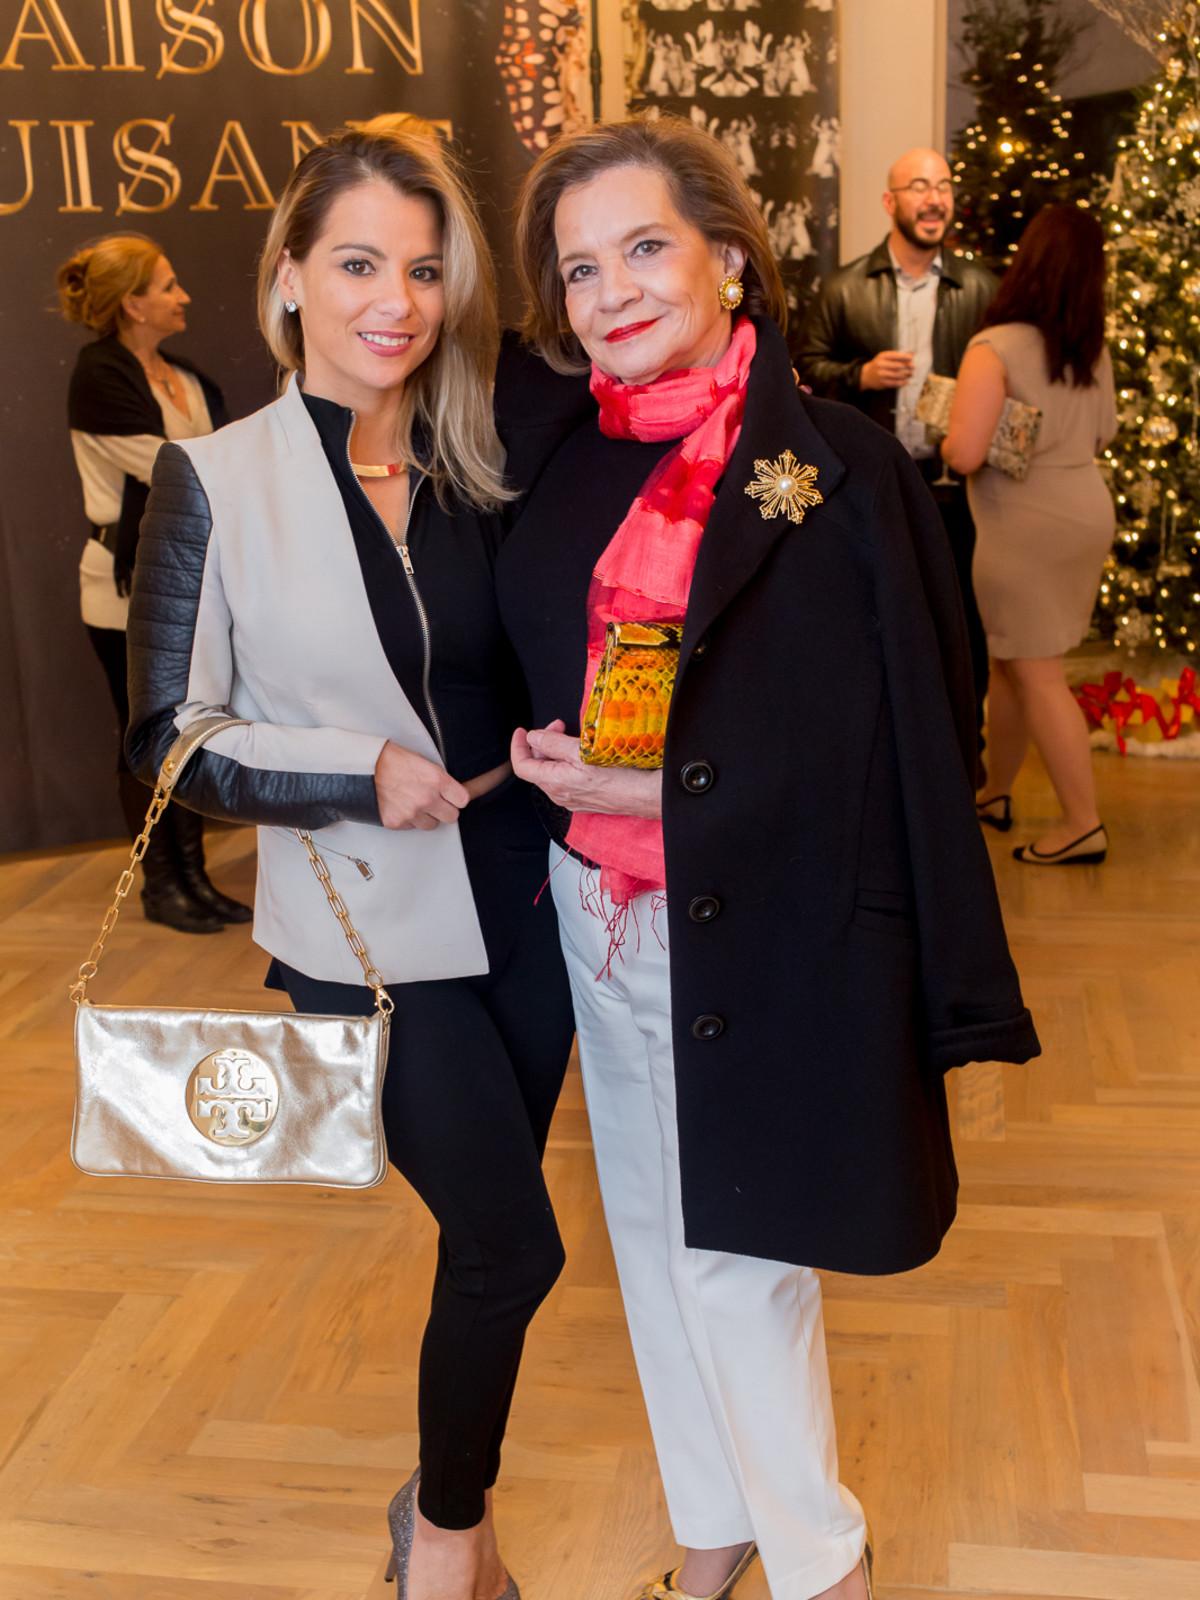 News, Roja Dove event, Dec. 2015, Mandy Bettega, Grace Bettega